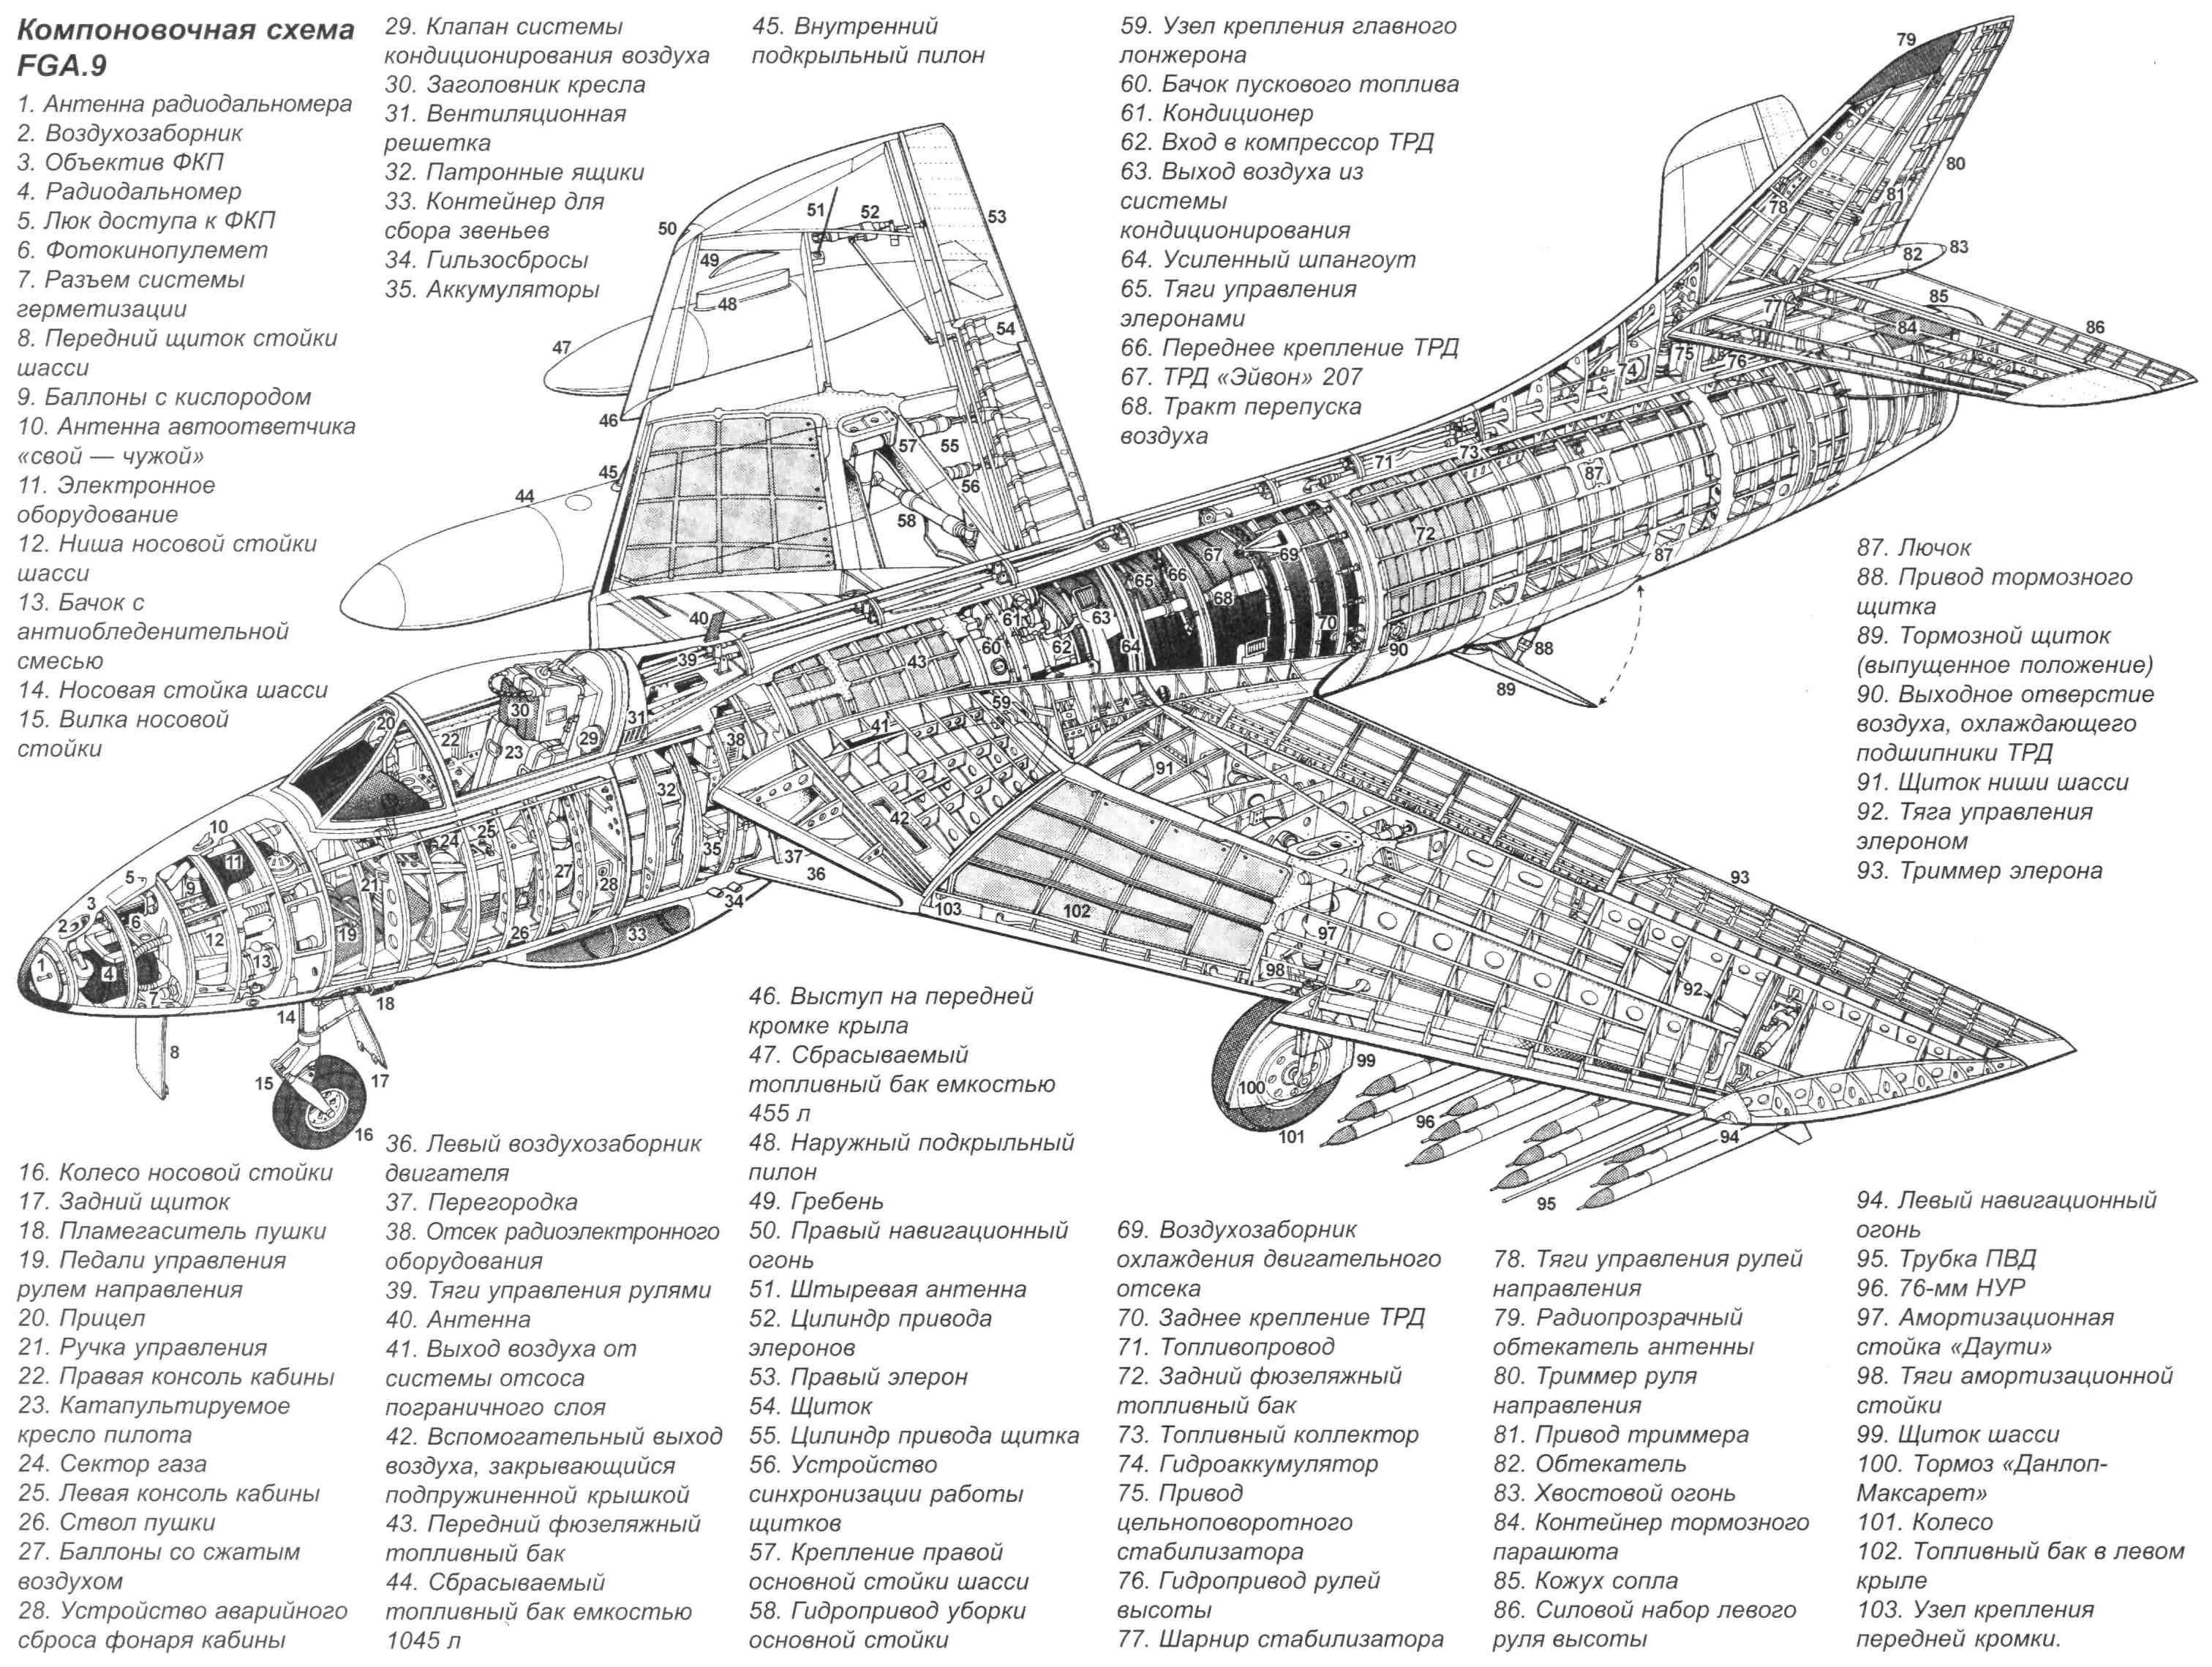 Aircarft Cutaway Cutaways